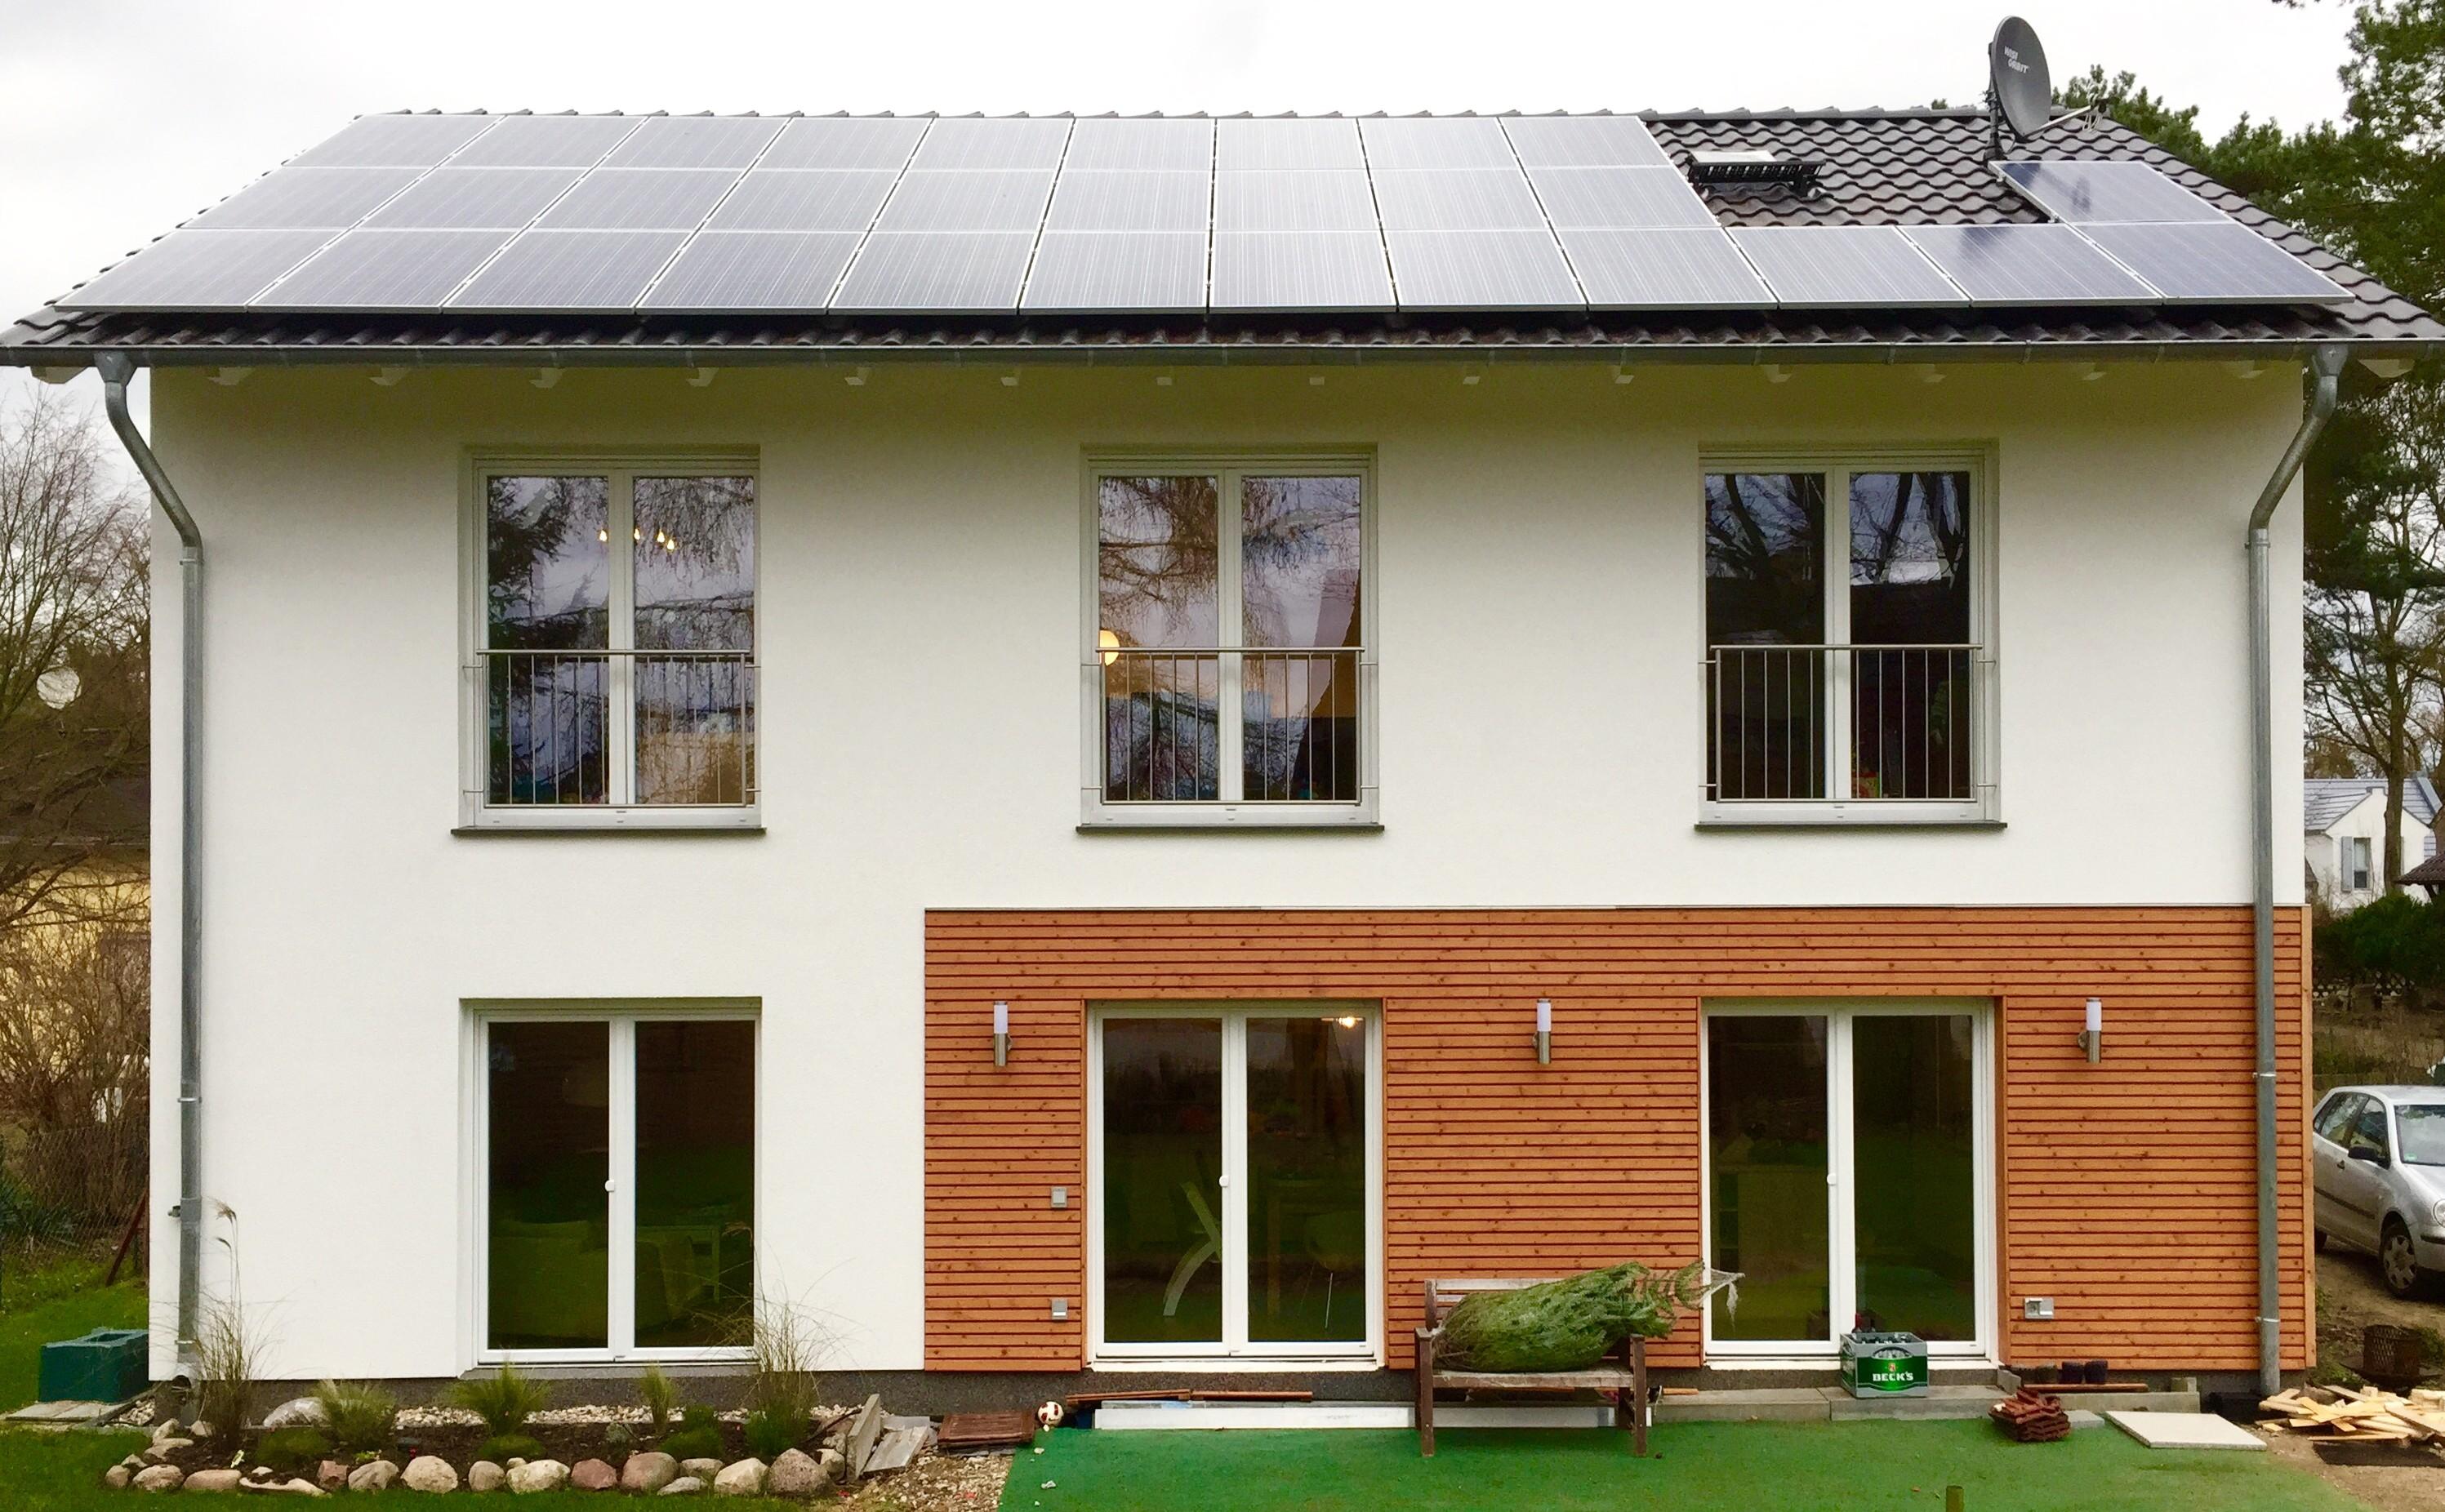 Haus mit PV-Anlage